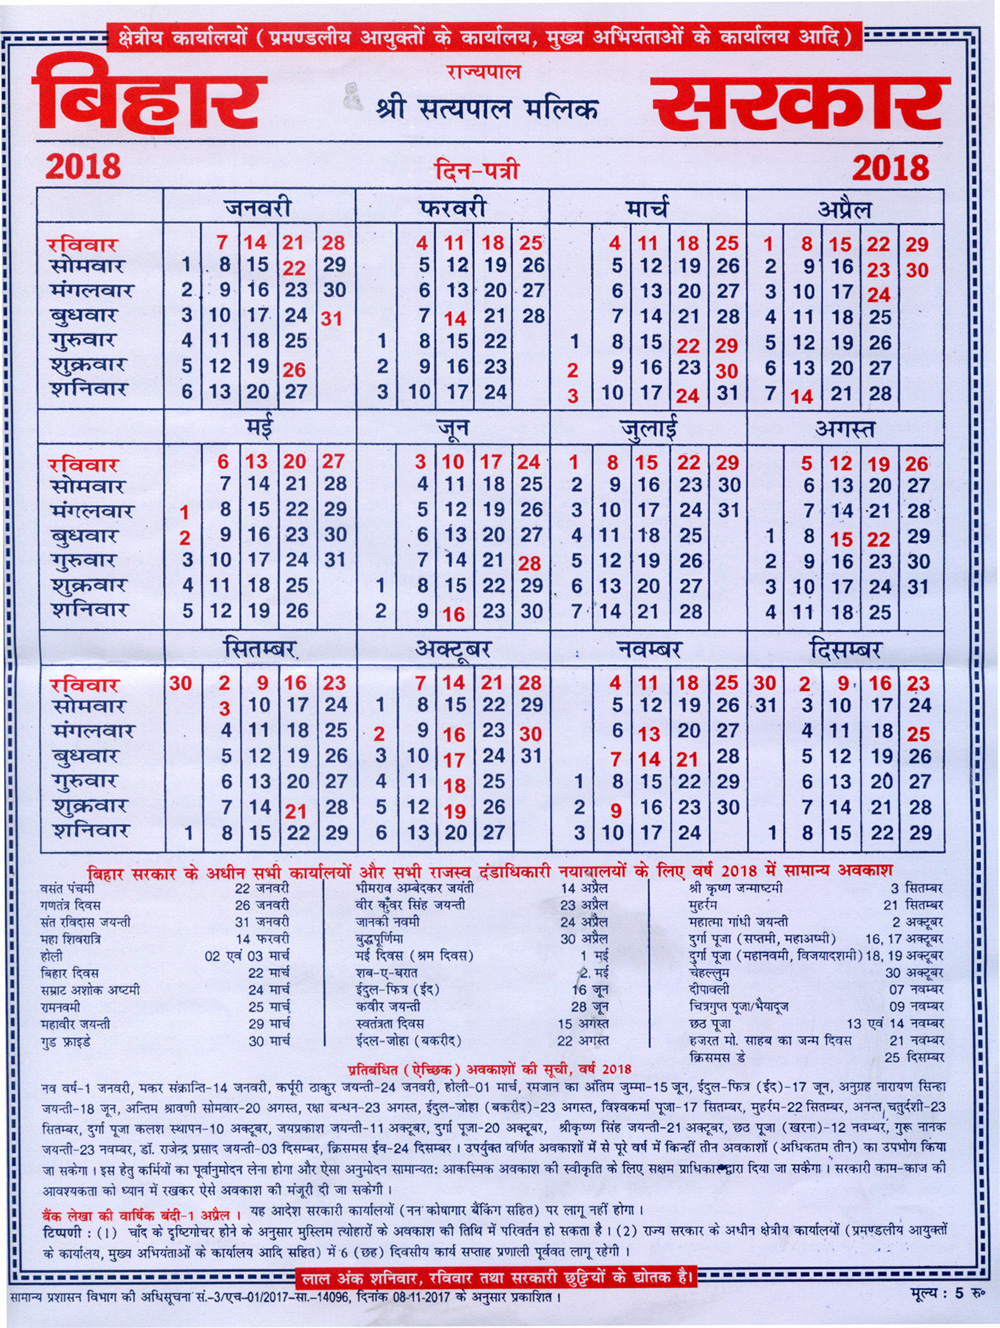 Bihar Govt. Calendar 2018, Bihar Govt. Holiday List, Holiday in Bihar Government Calender 2020